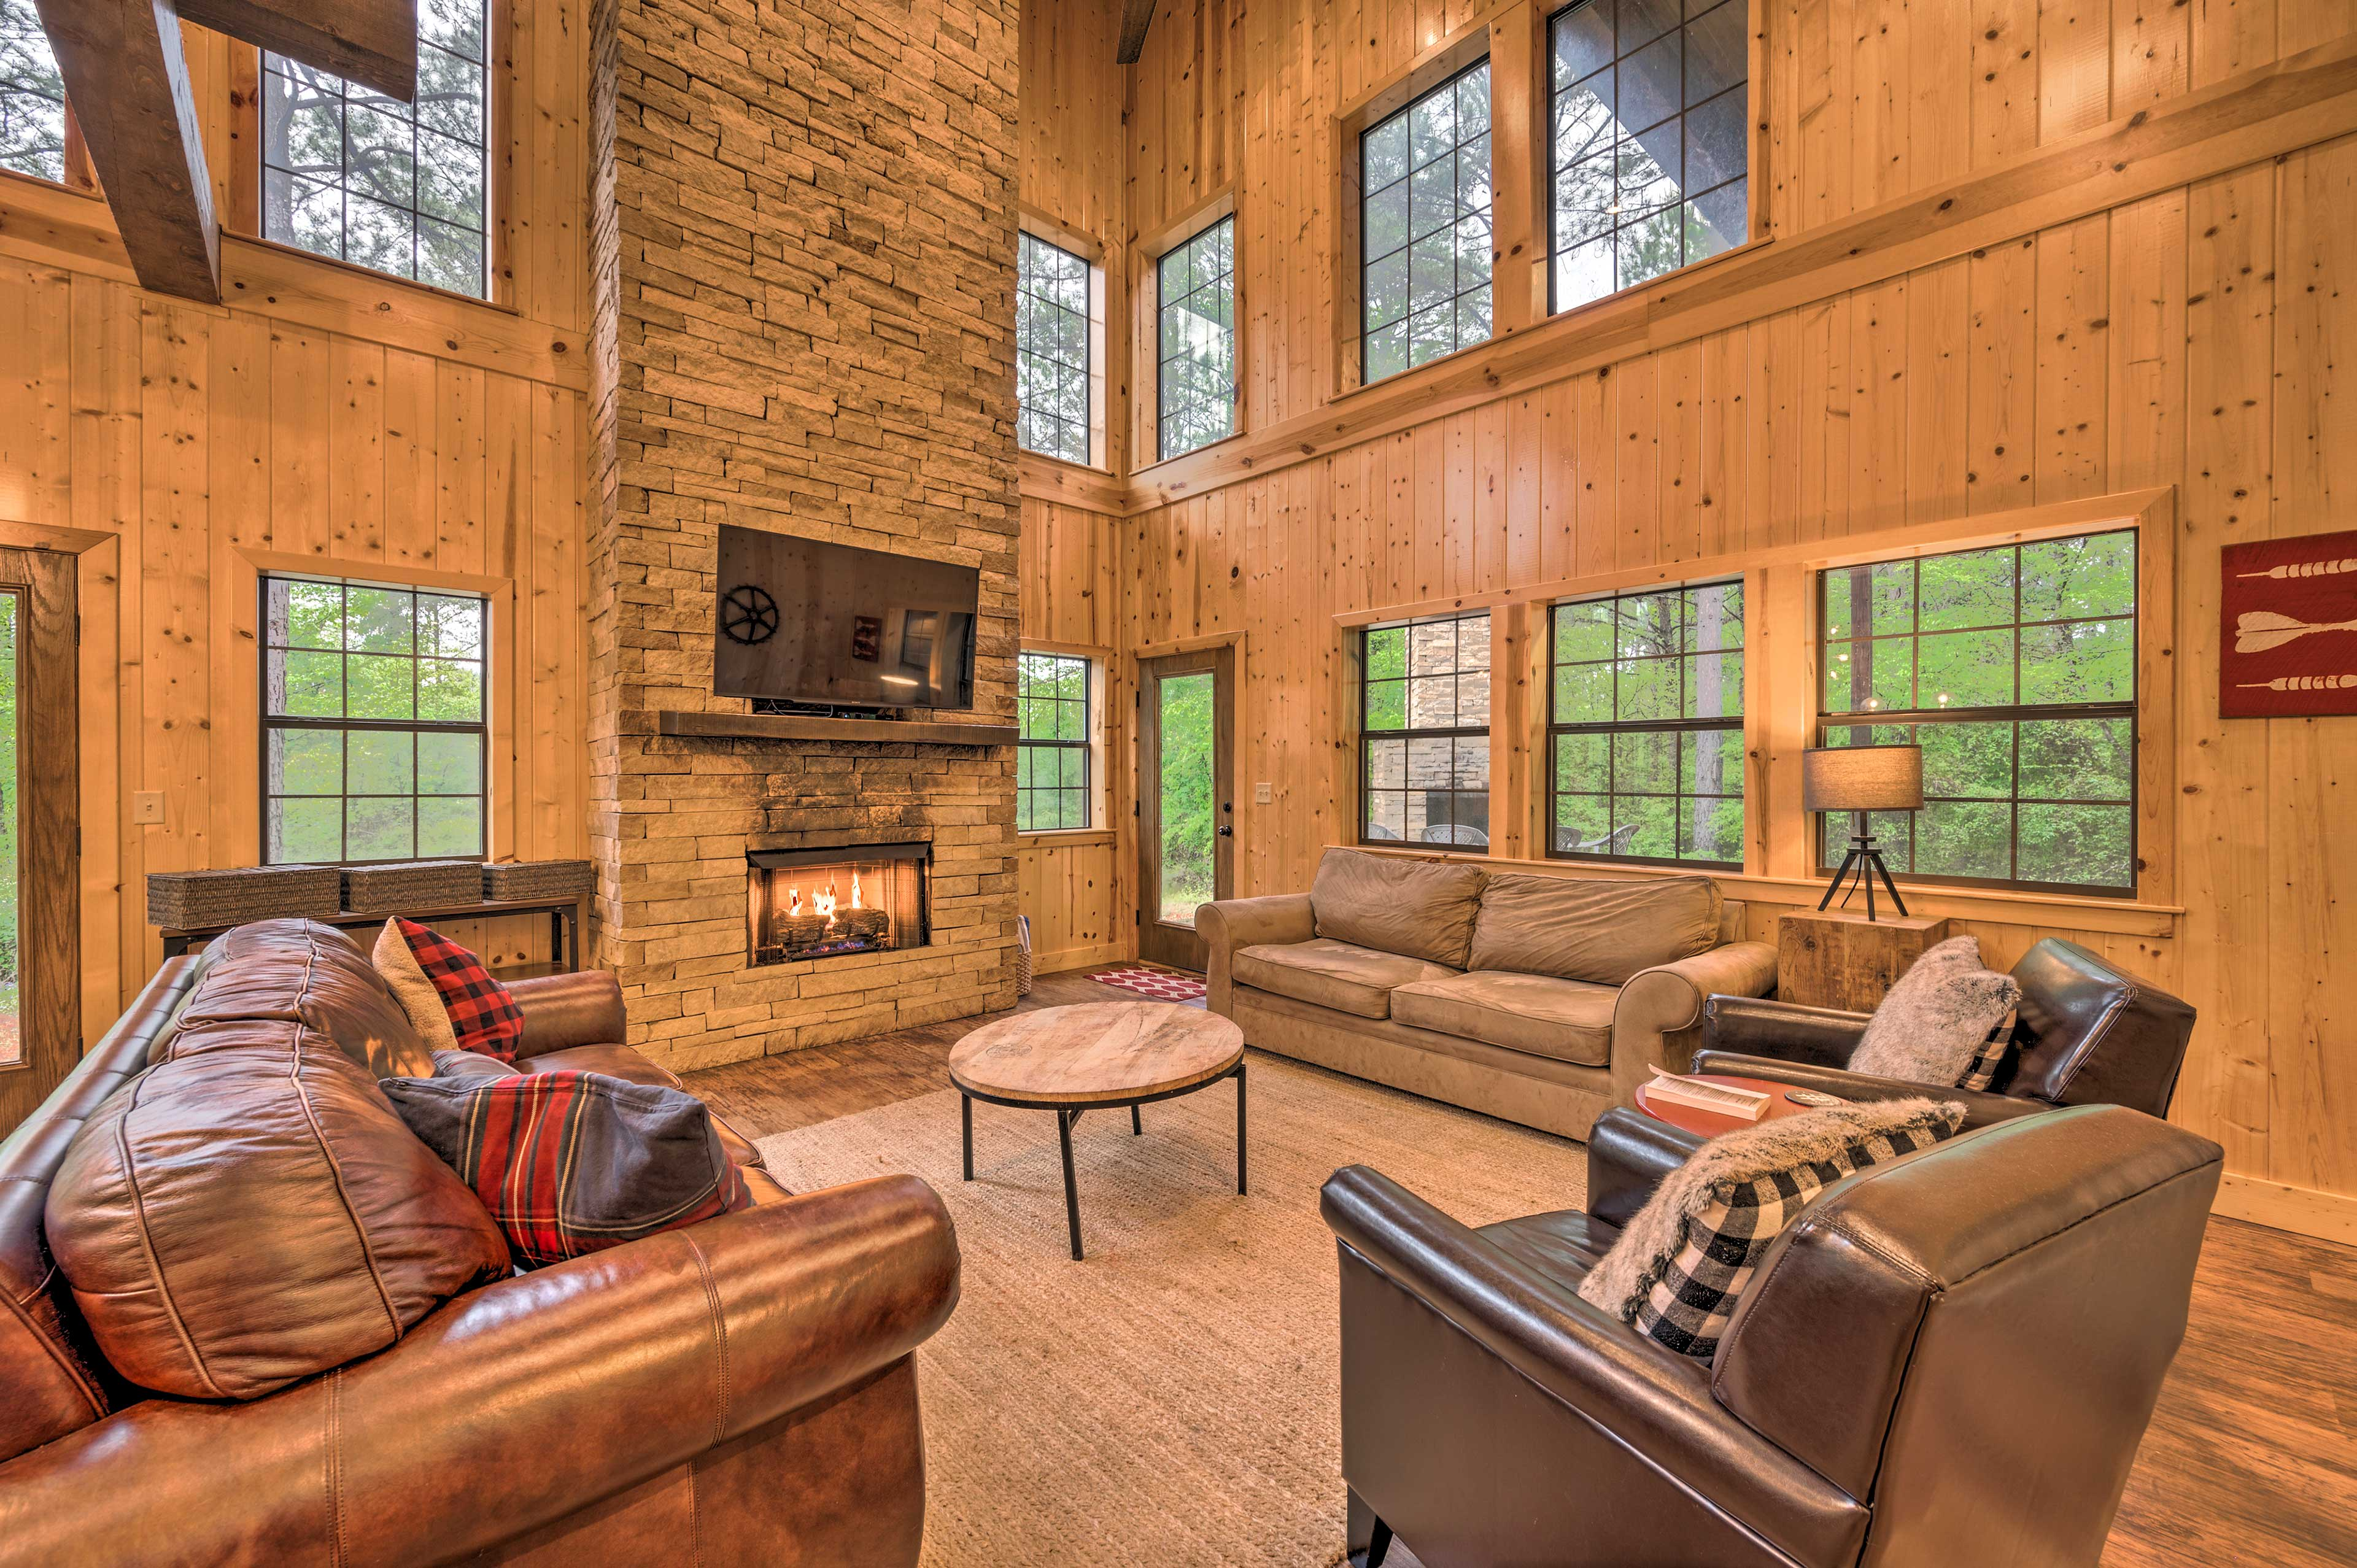 Living Room | Gas Fireplace | Smart TV w/ YouTube TV